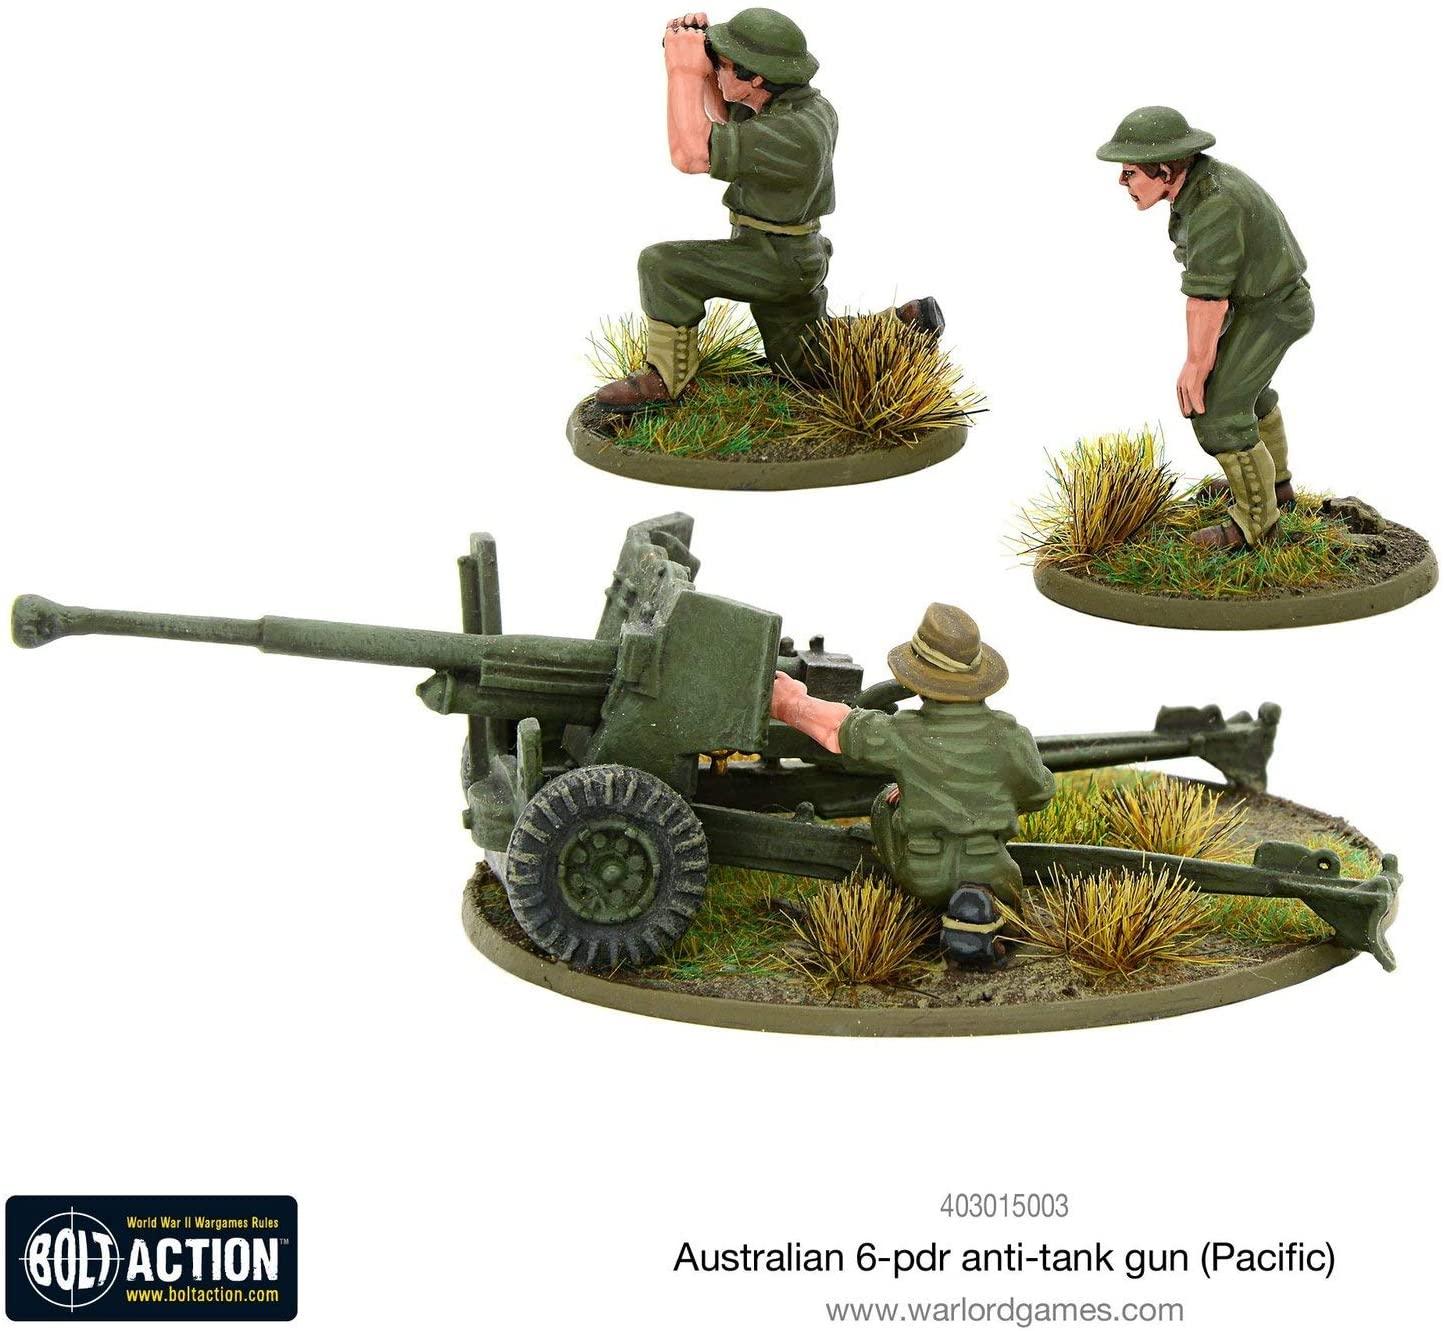 Warlord Games, Bolt Action, Australian 6-PDR Anti-Tank Gun (Pacific)